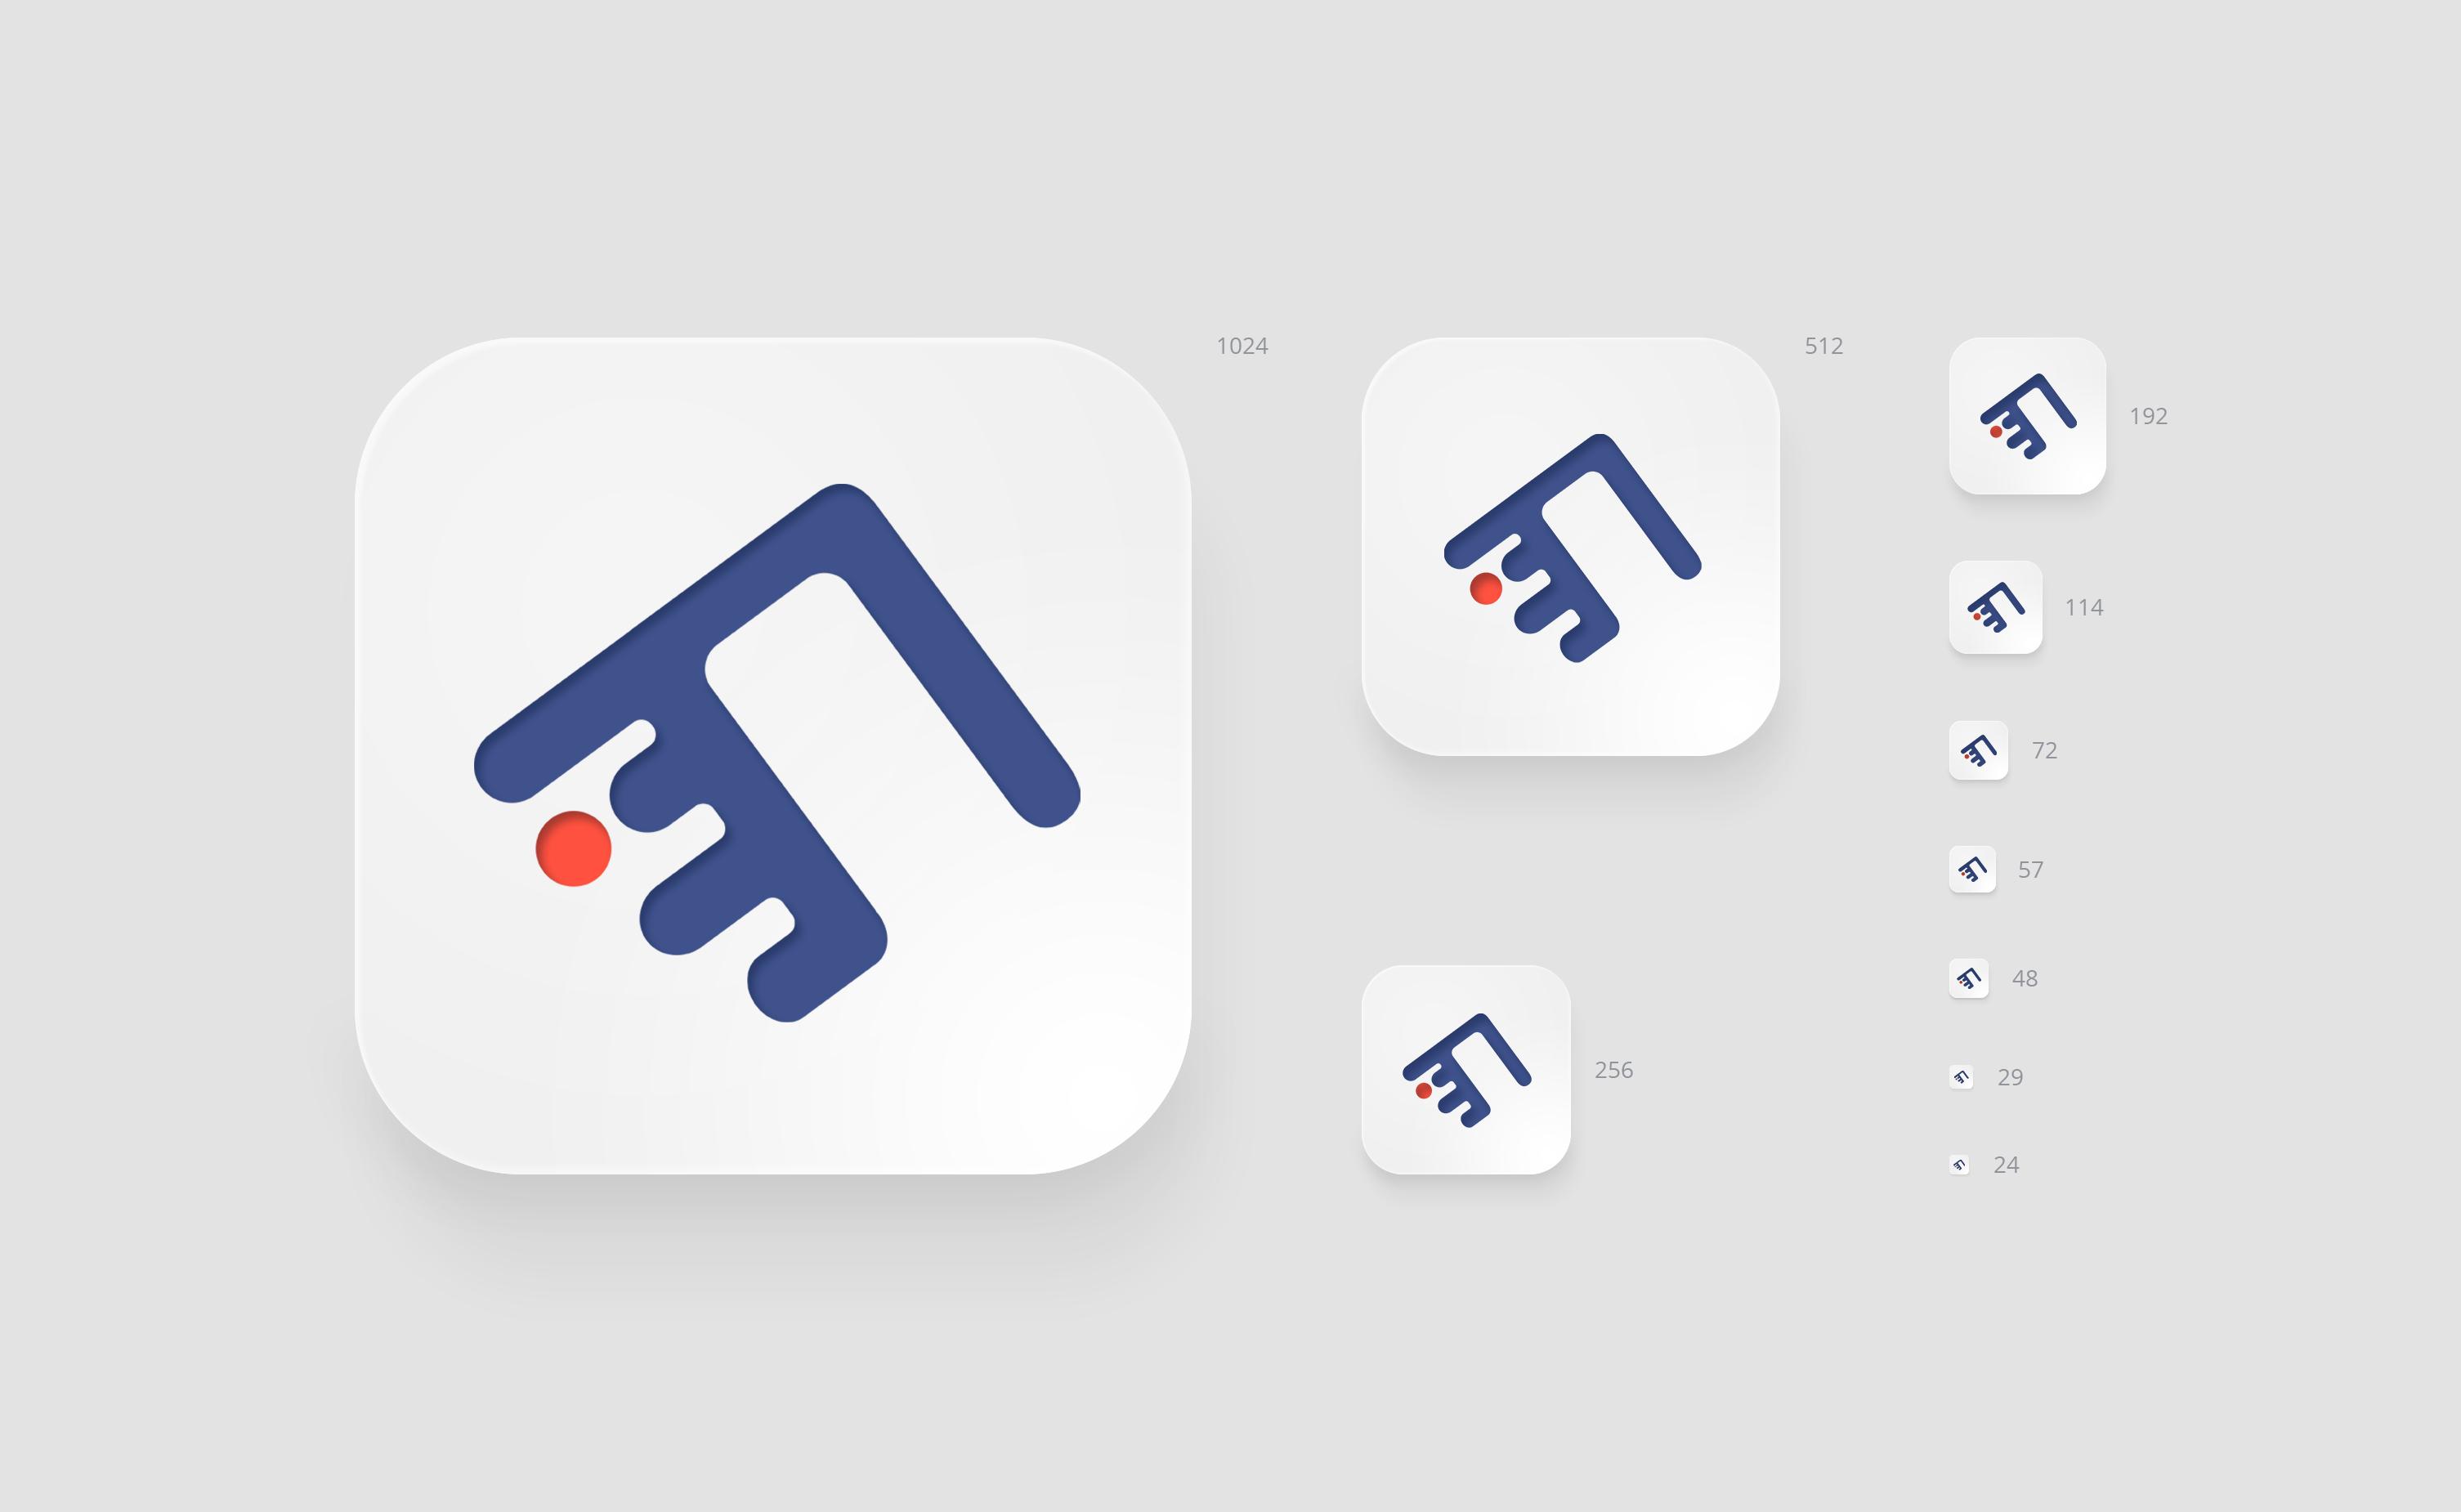 Логотип для веб-сервиса интерьерной печати и оперативной пол фото f_5895d2c012159143.jpg